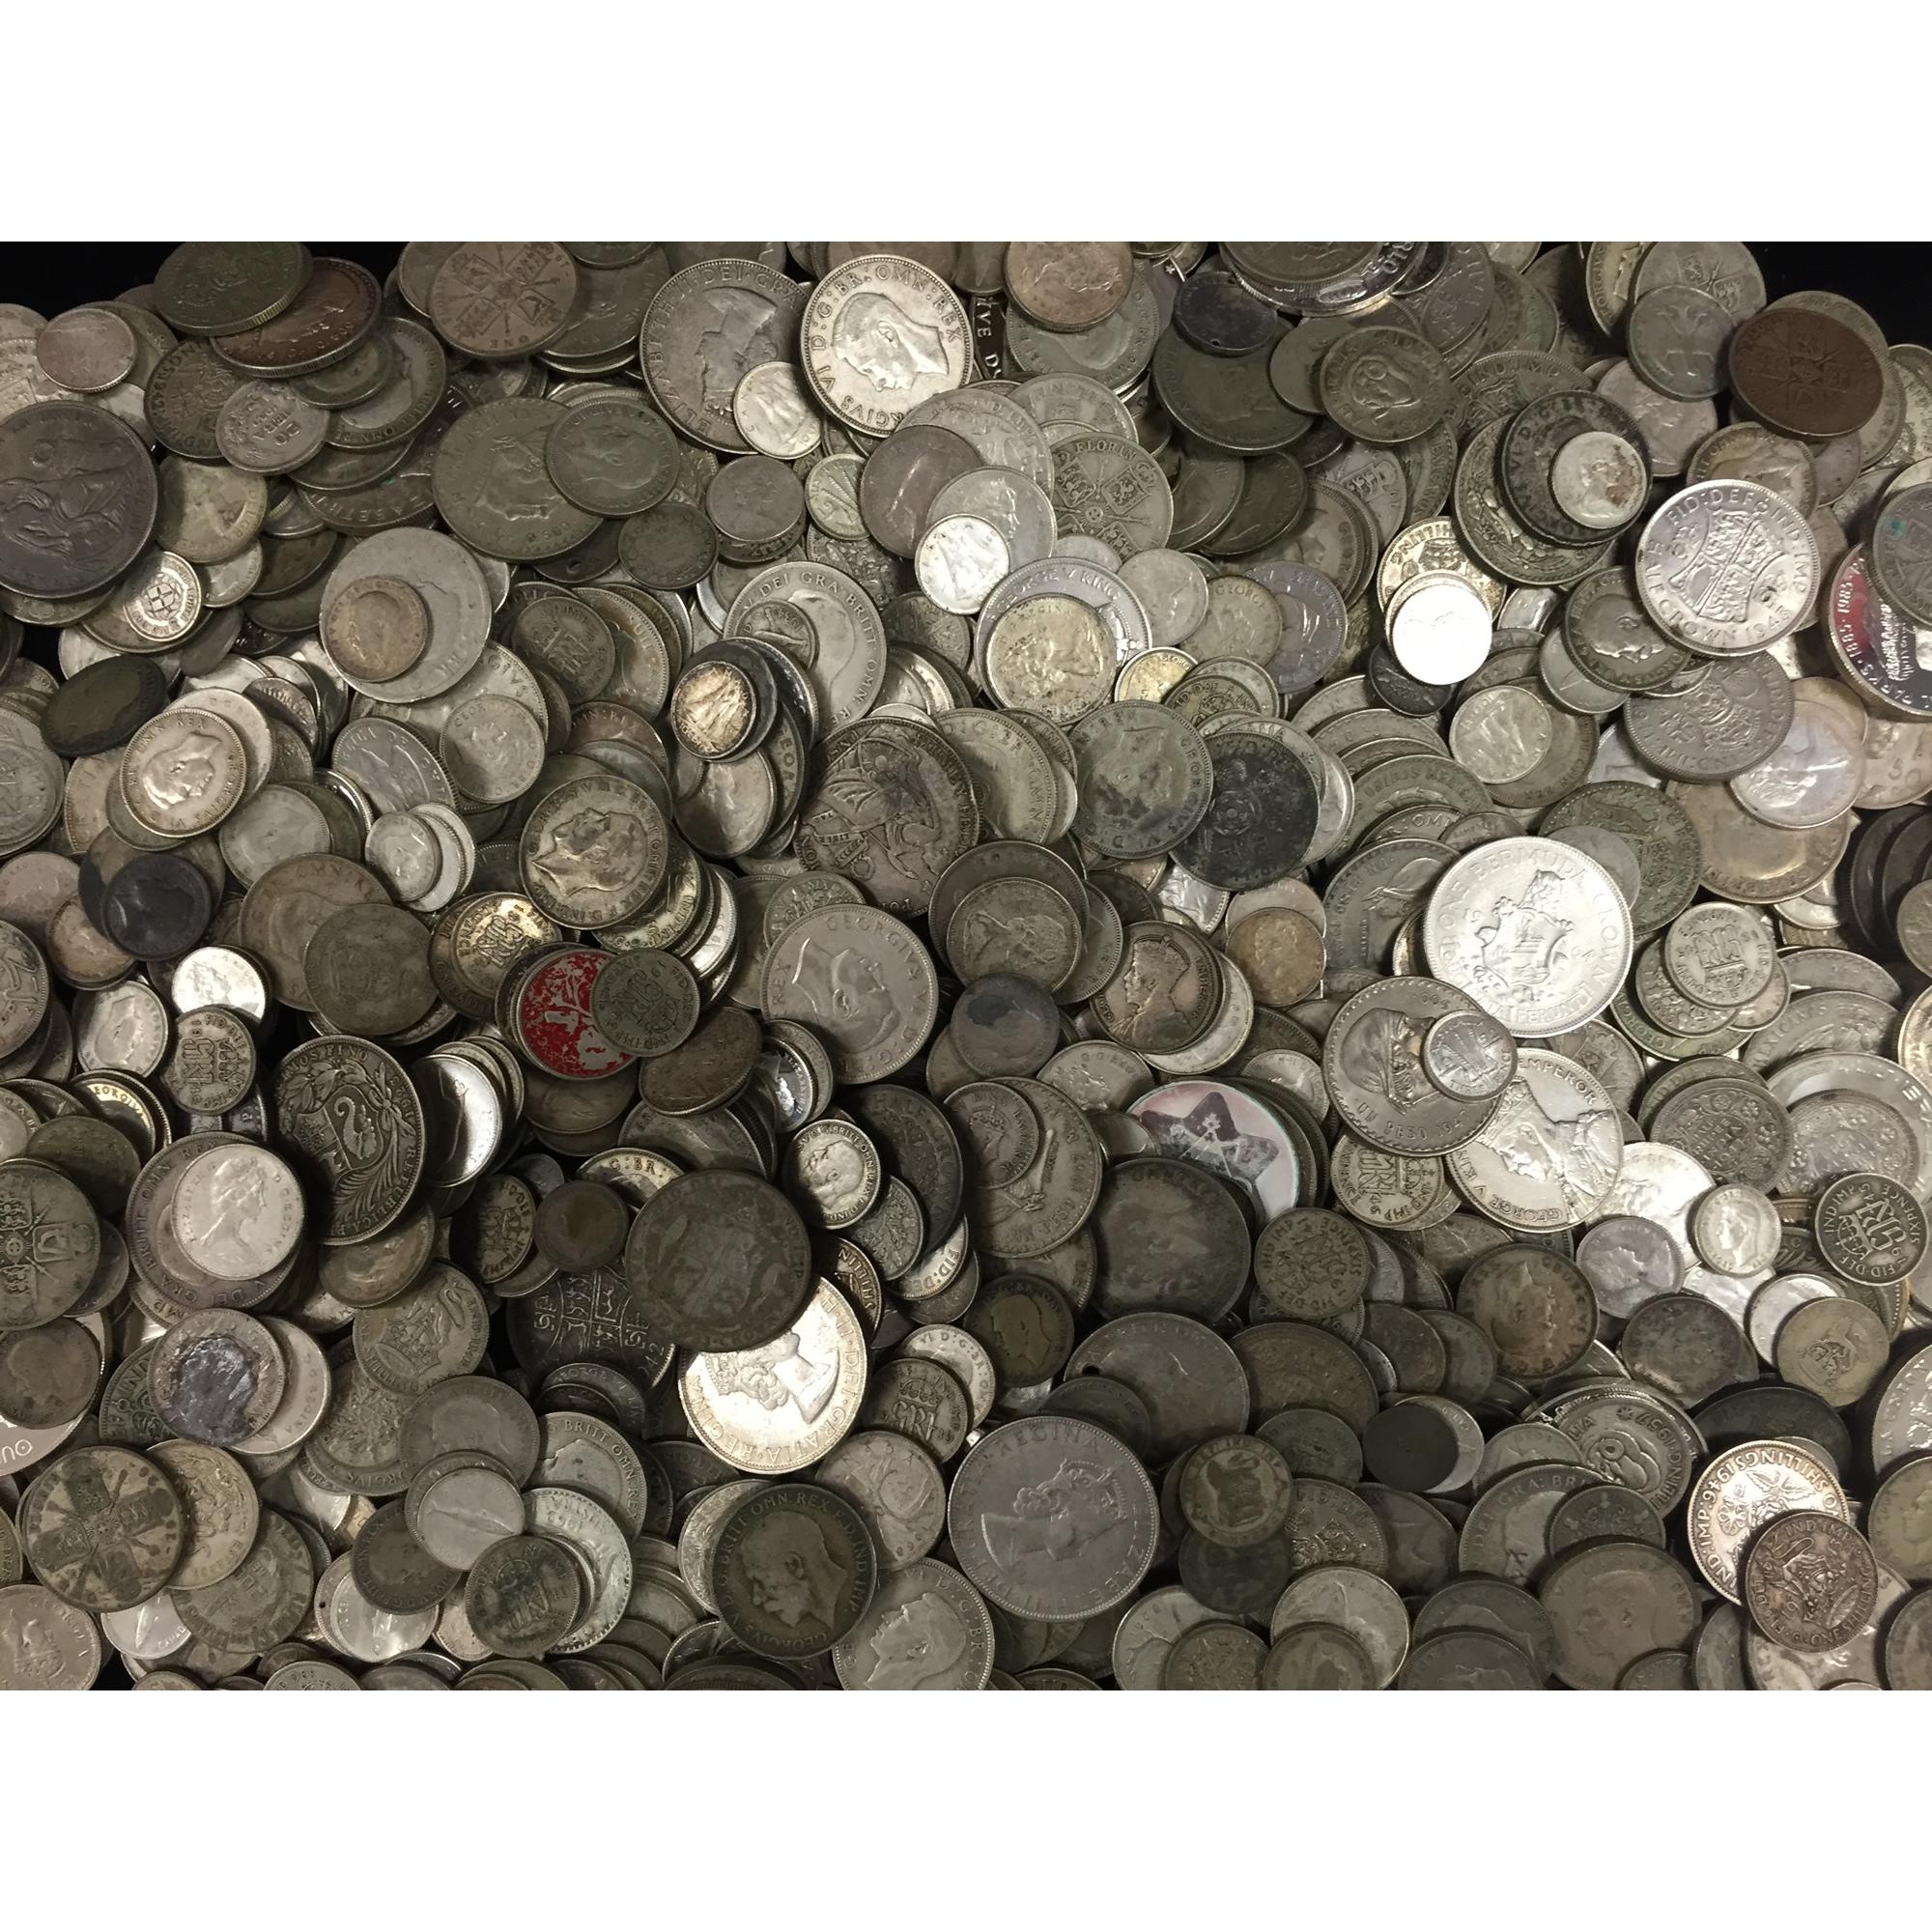 10 ounces 50% pure silver world coins